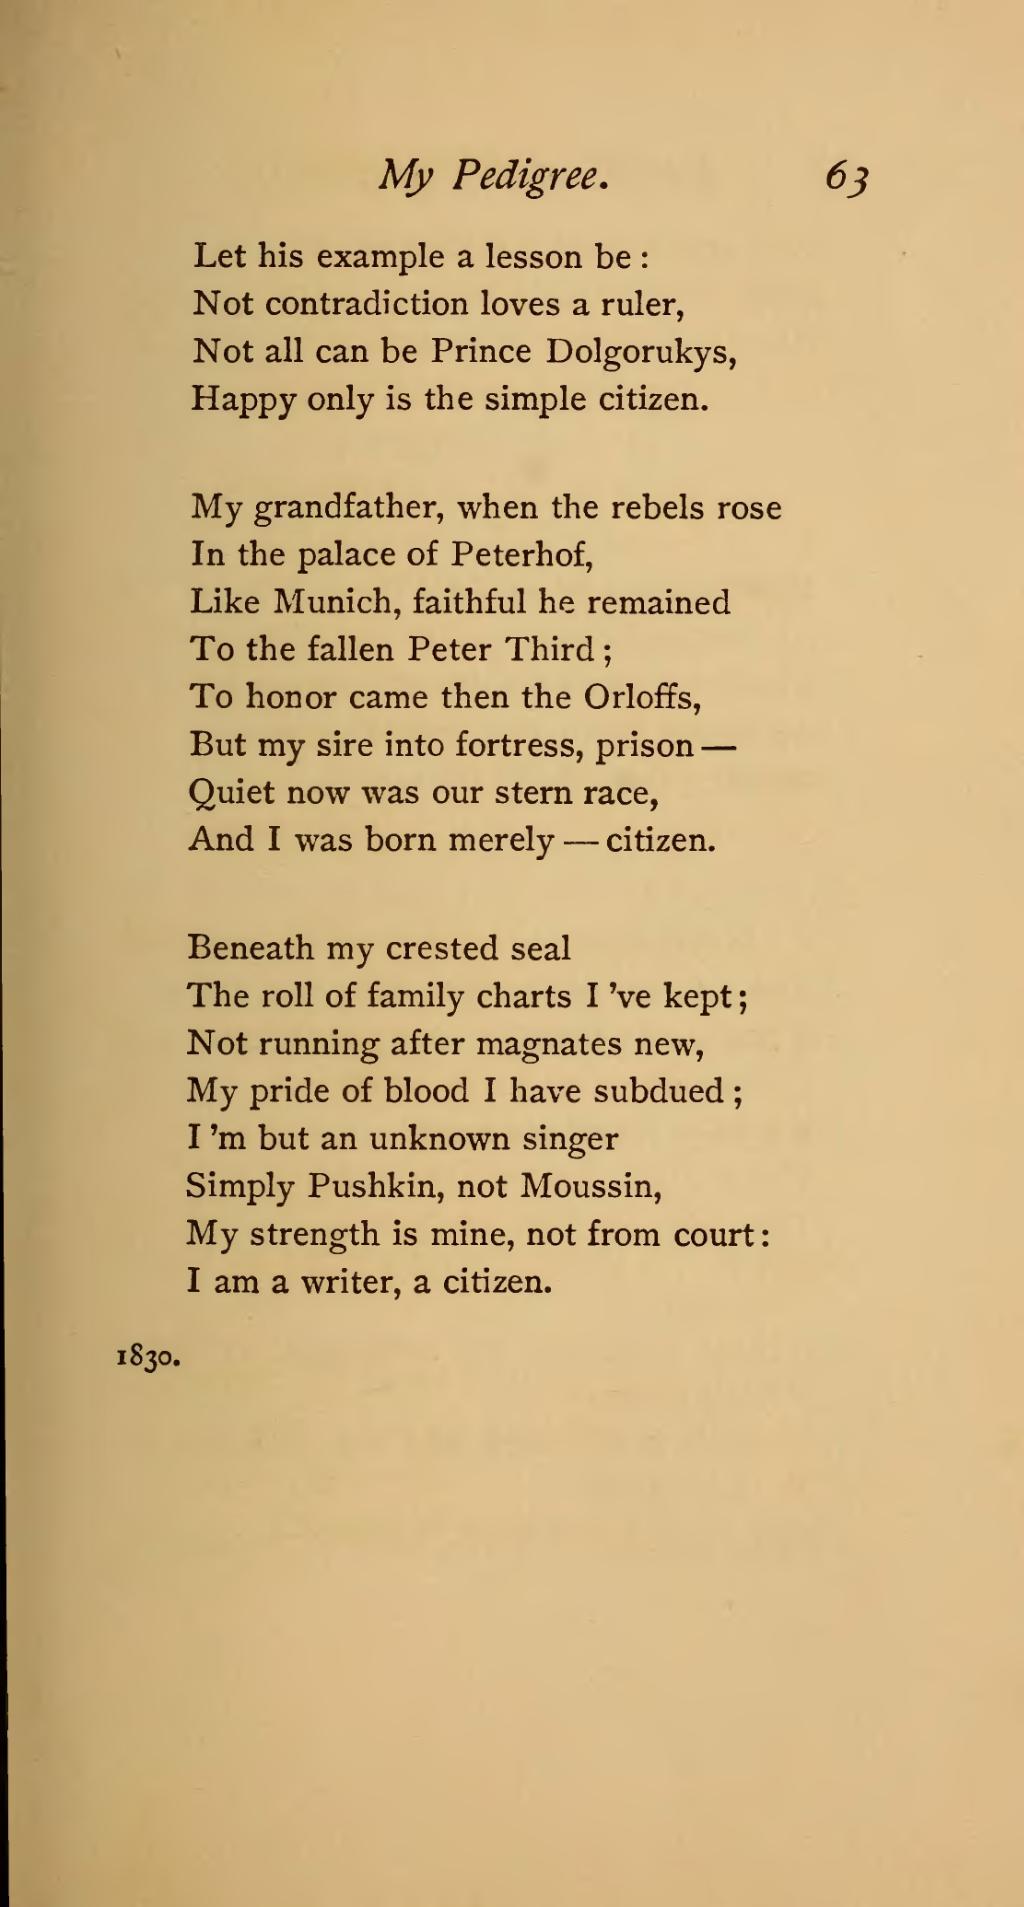 Did Alexander Pushkin write obscene poems? 54